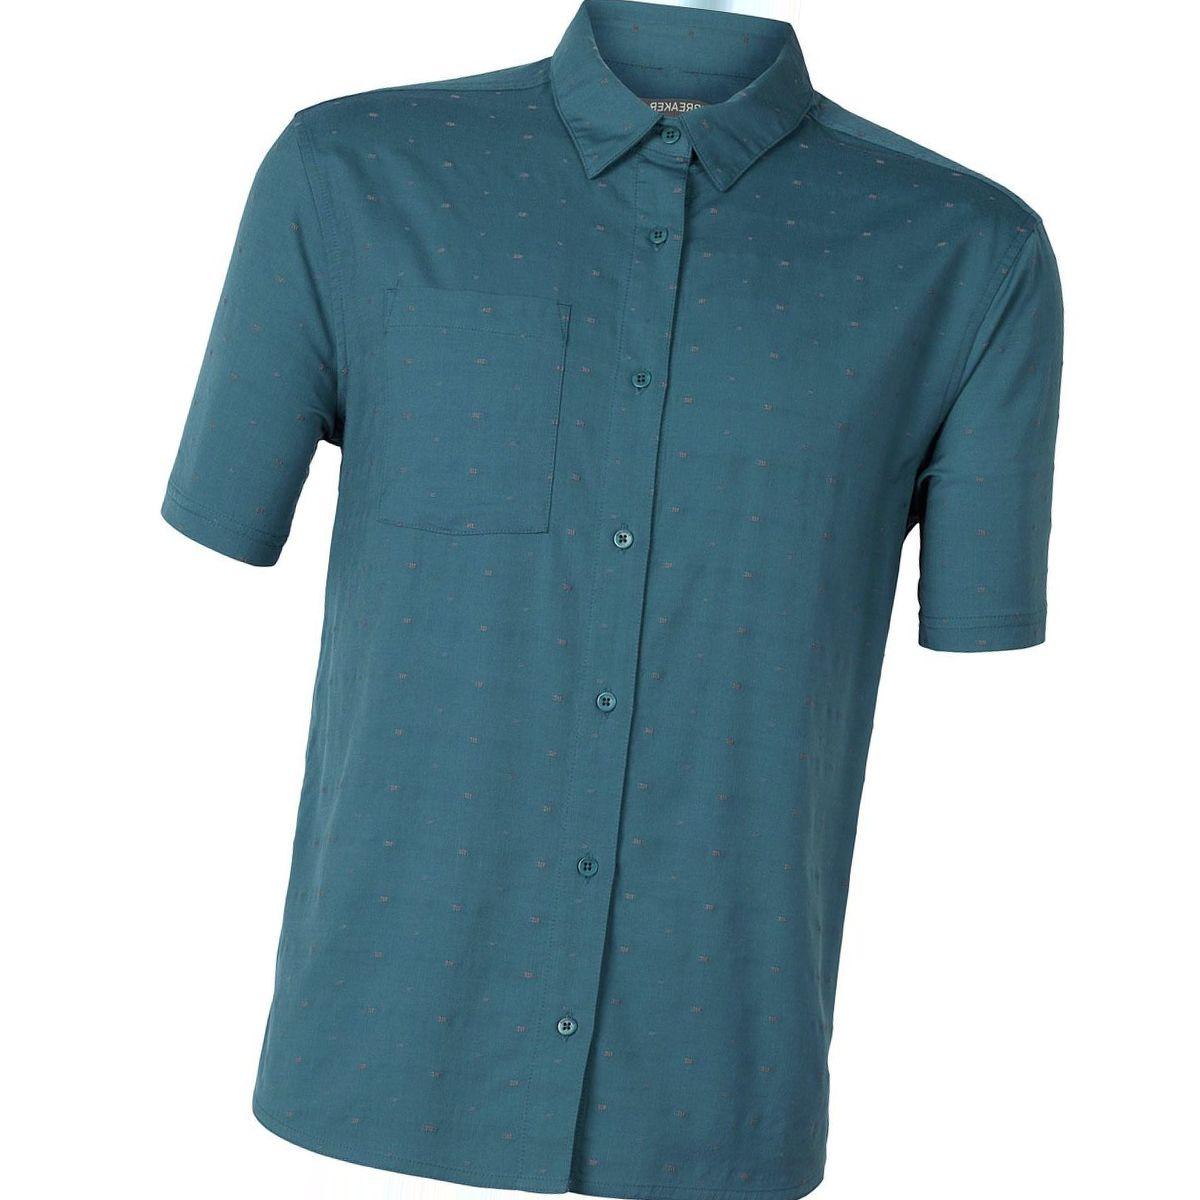 Icebreaker Compass Short-Sleeve Shirt - Men's